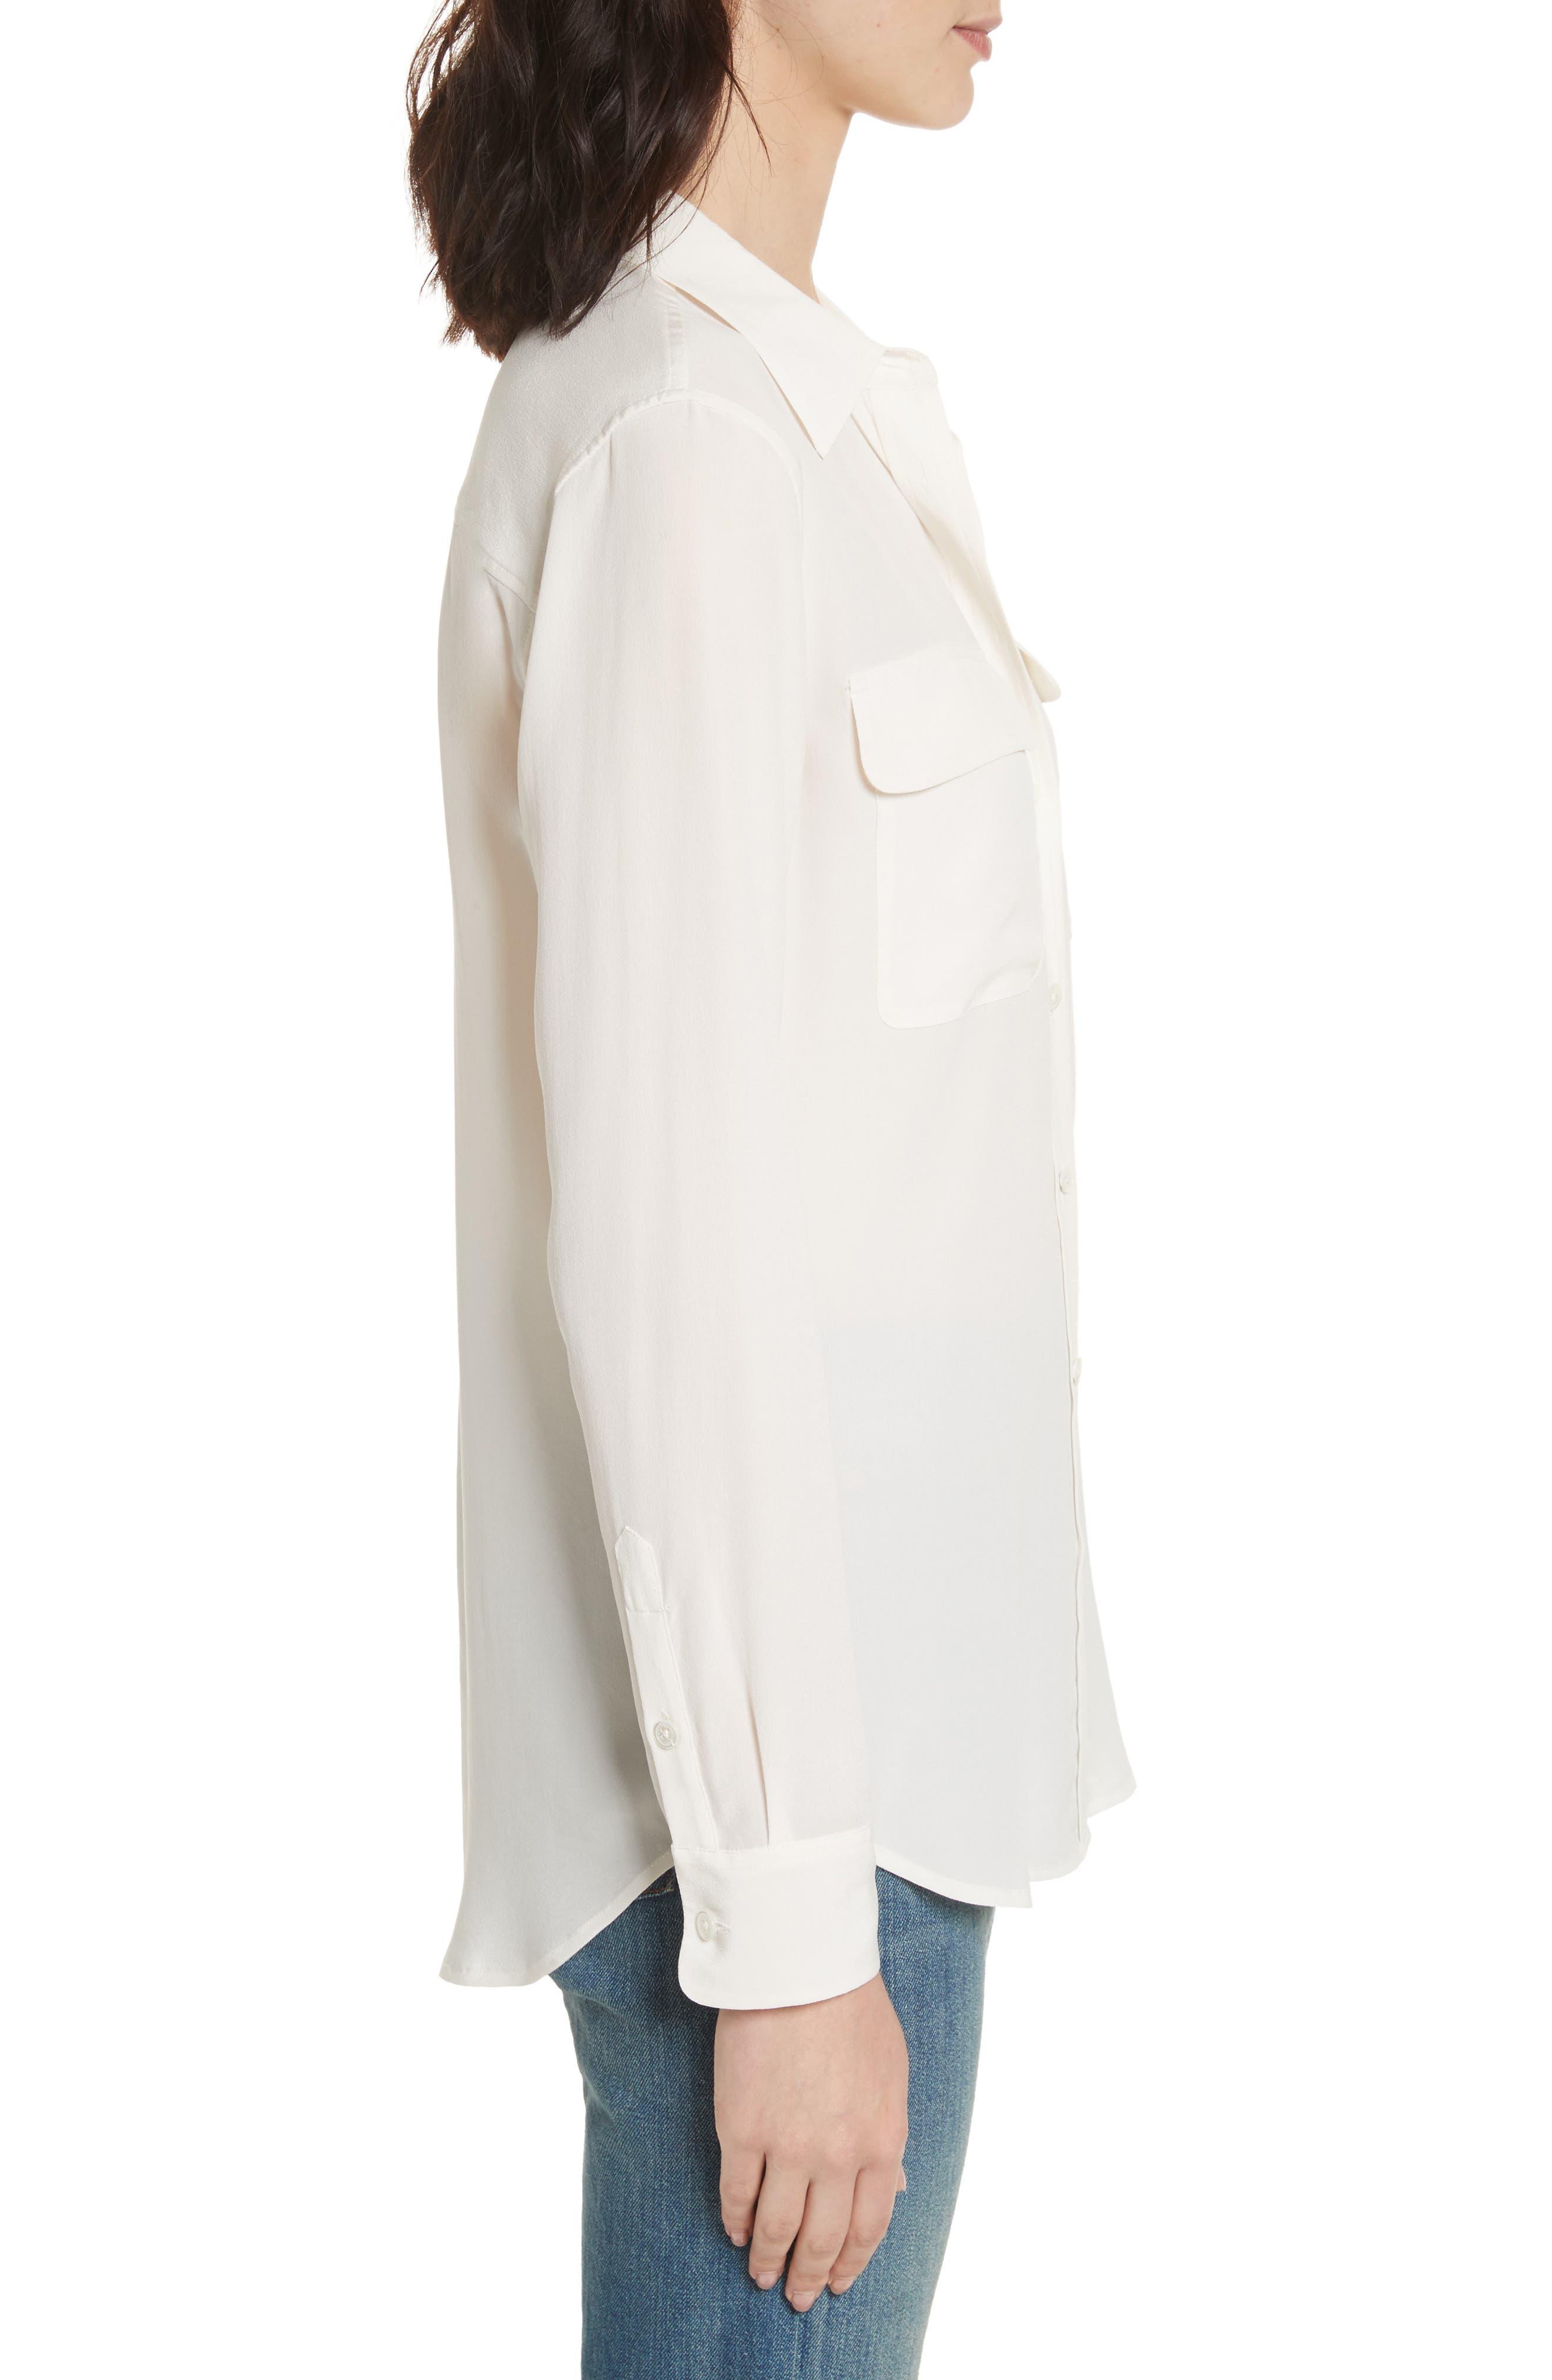 EQUIPMENT,                             'Slim Signature' Silk Shirt,                             Alternate thumbnail 3, color,                             BRIGHT WHITE